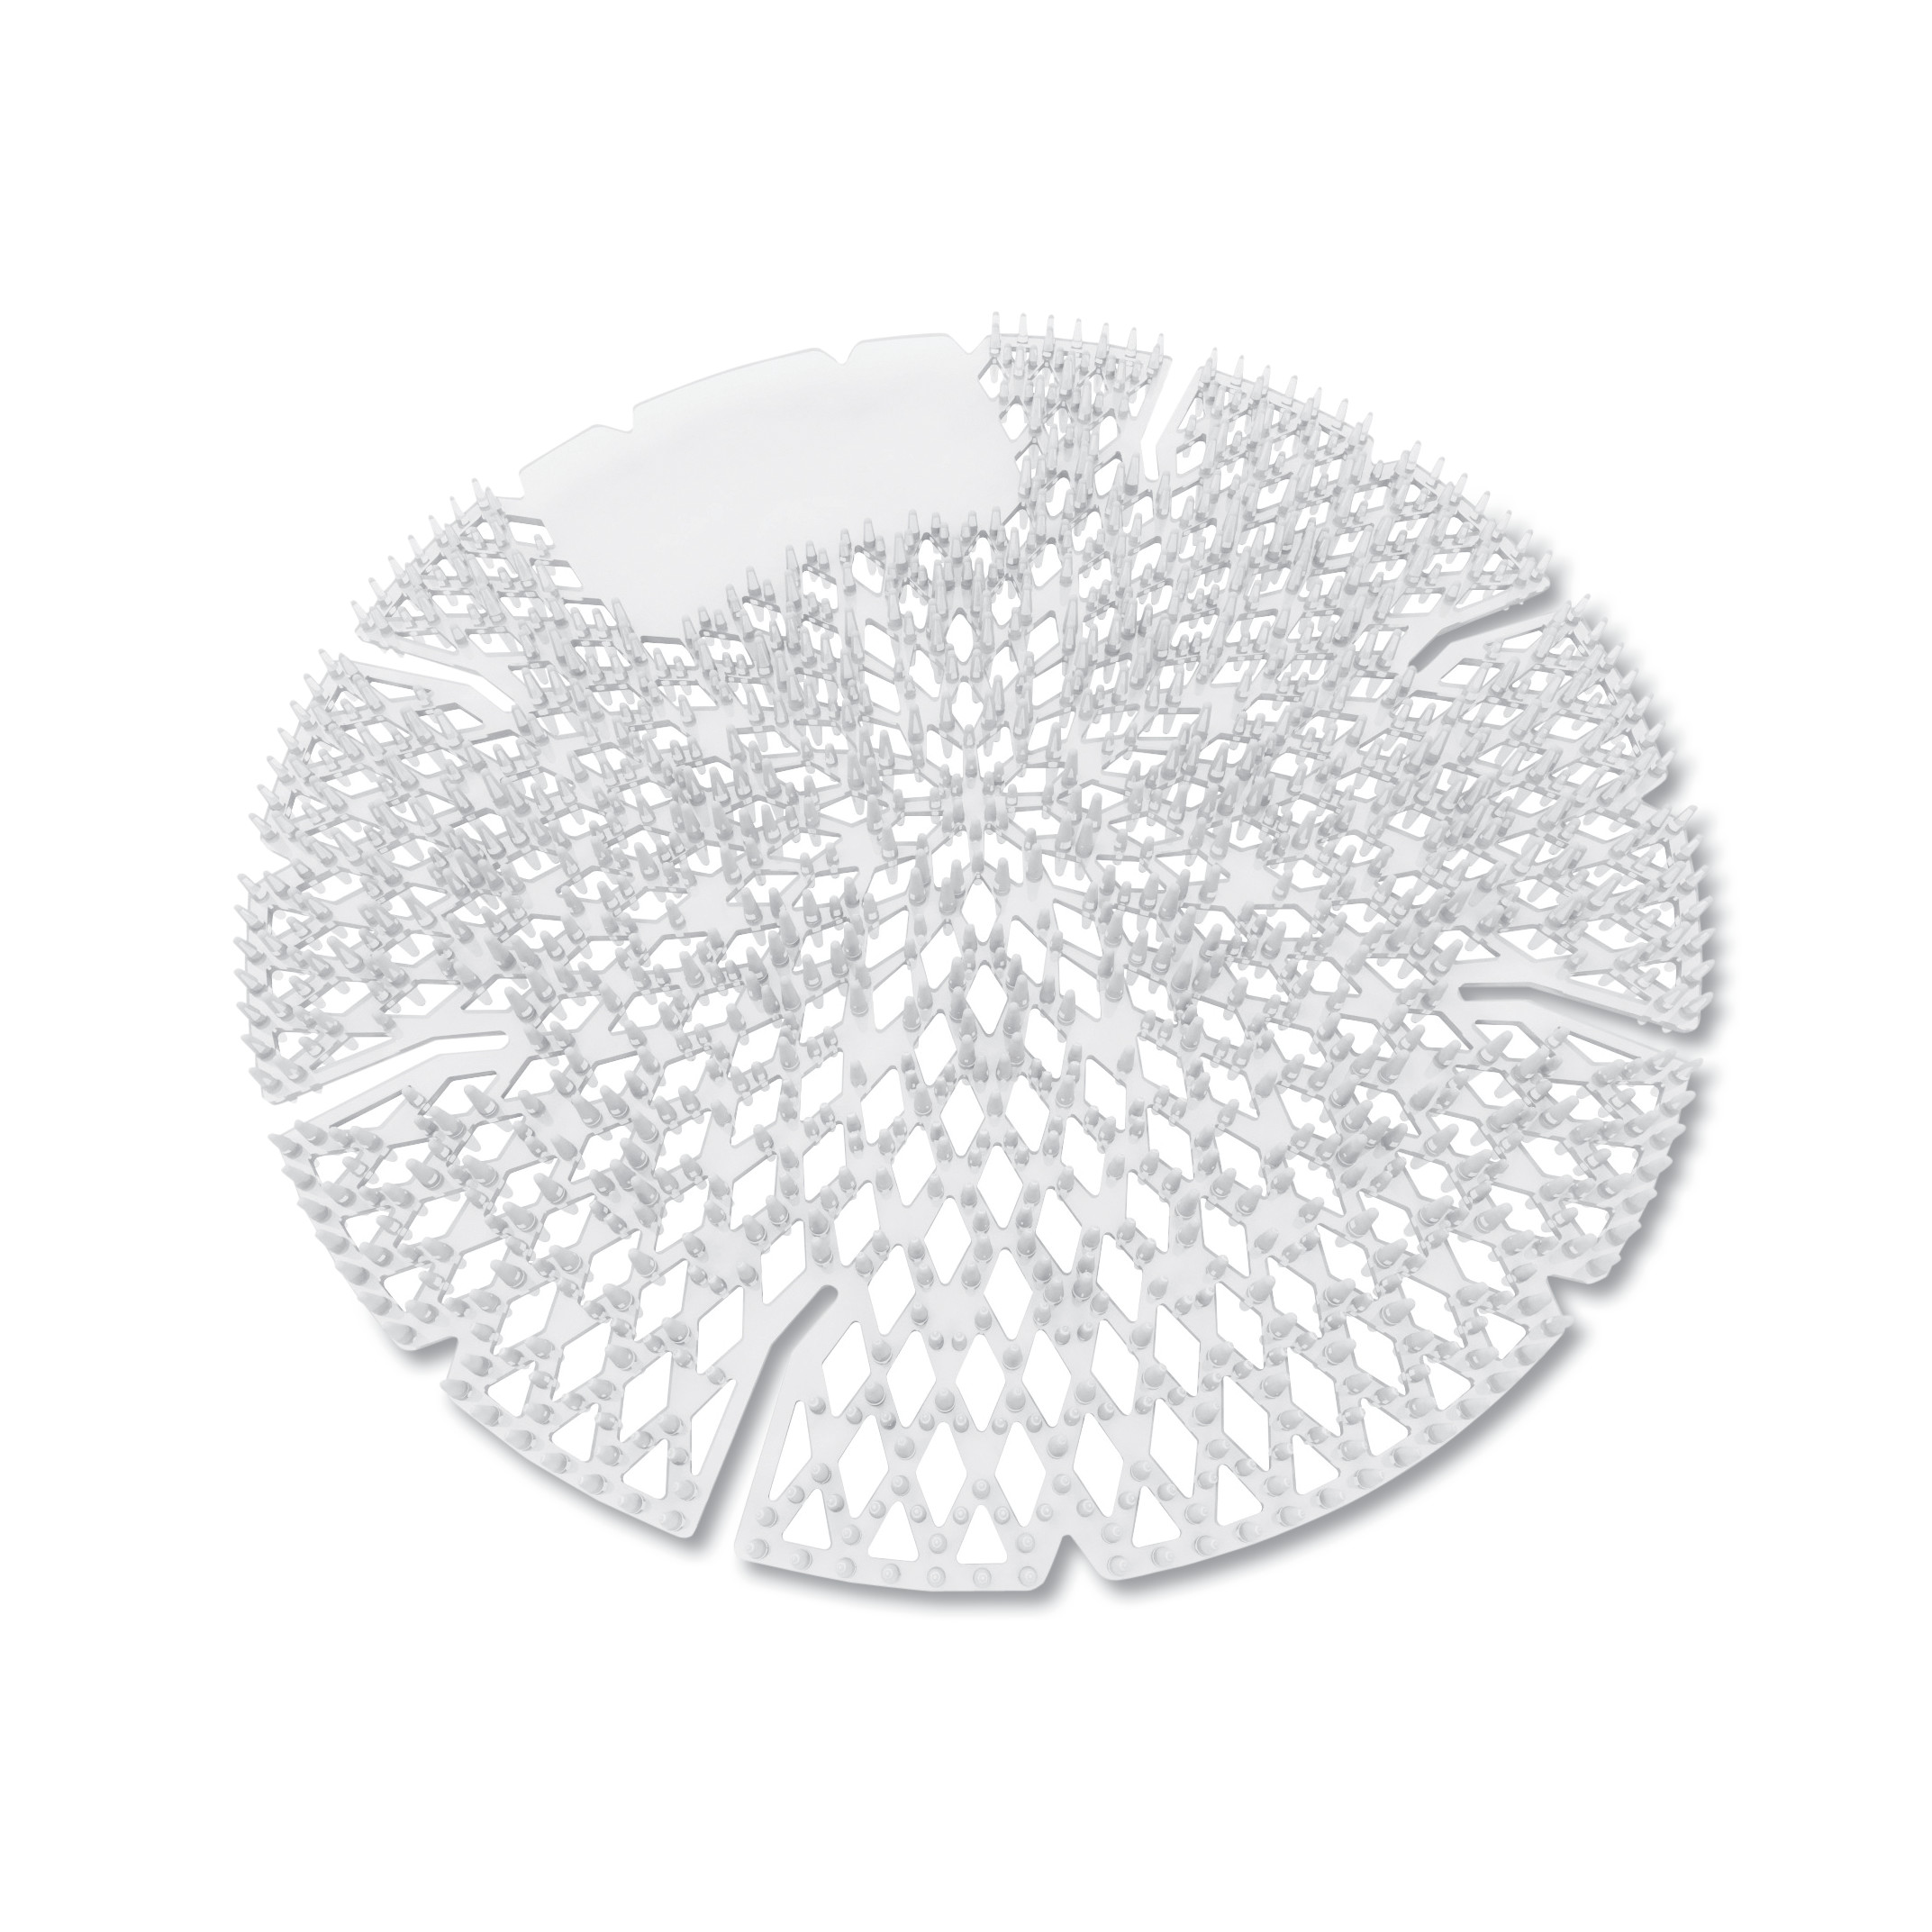 Diamond 3D Urinal Screen, Melon Mist, Clear, 10/Pack, 6 Pack/Carton